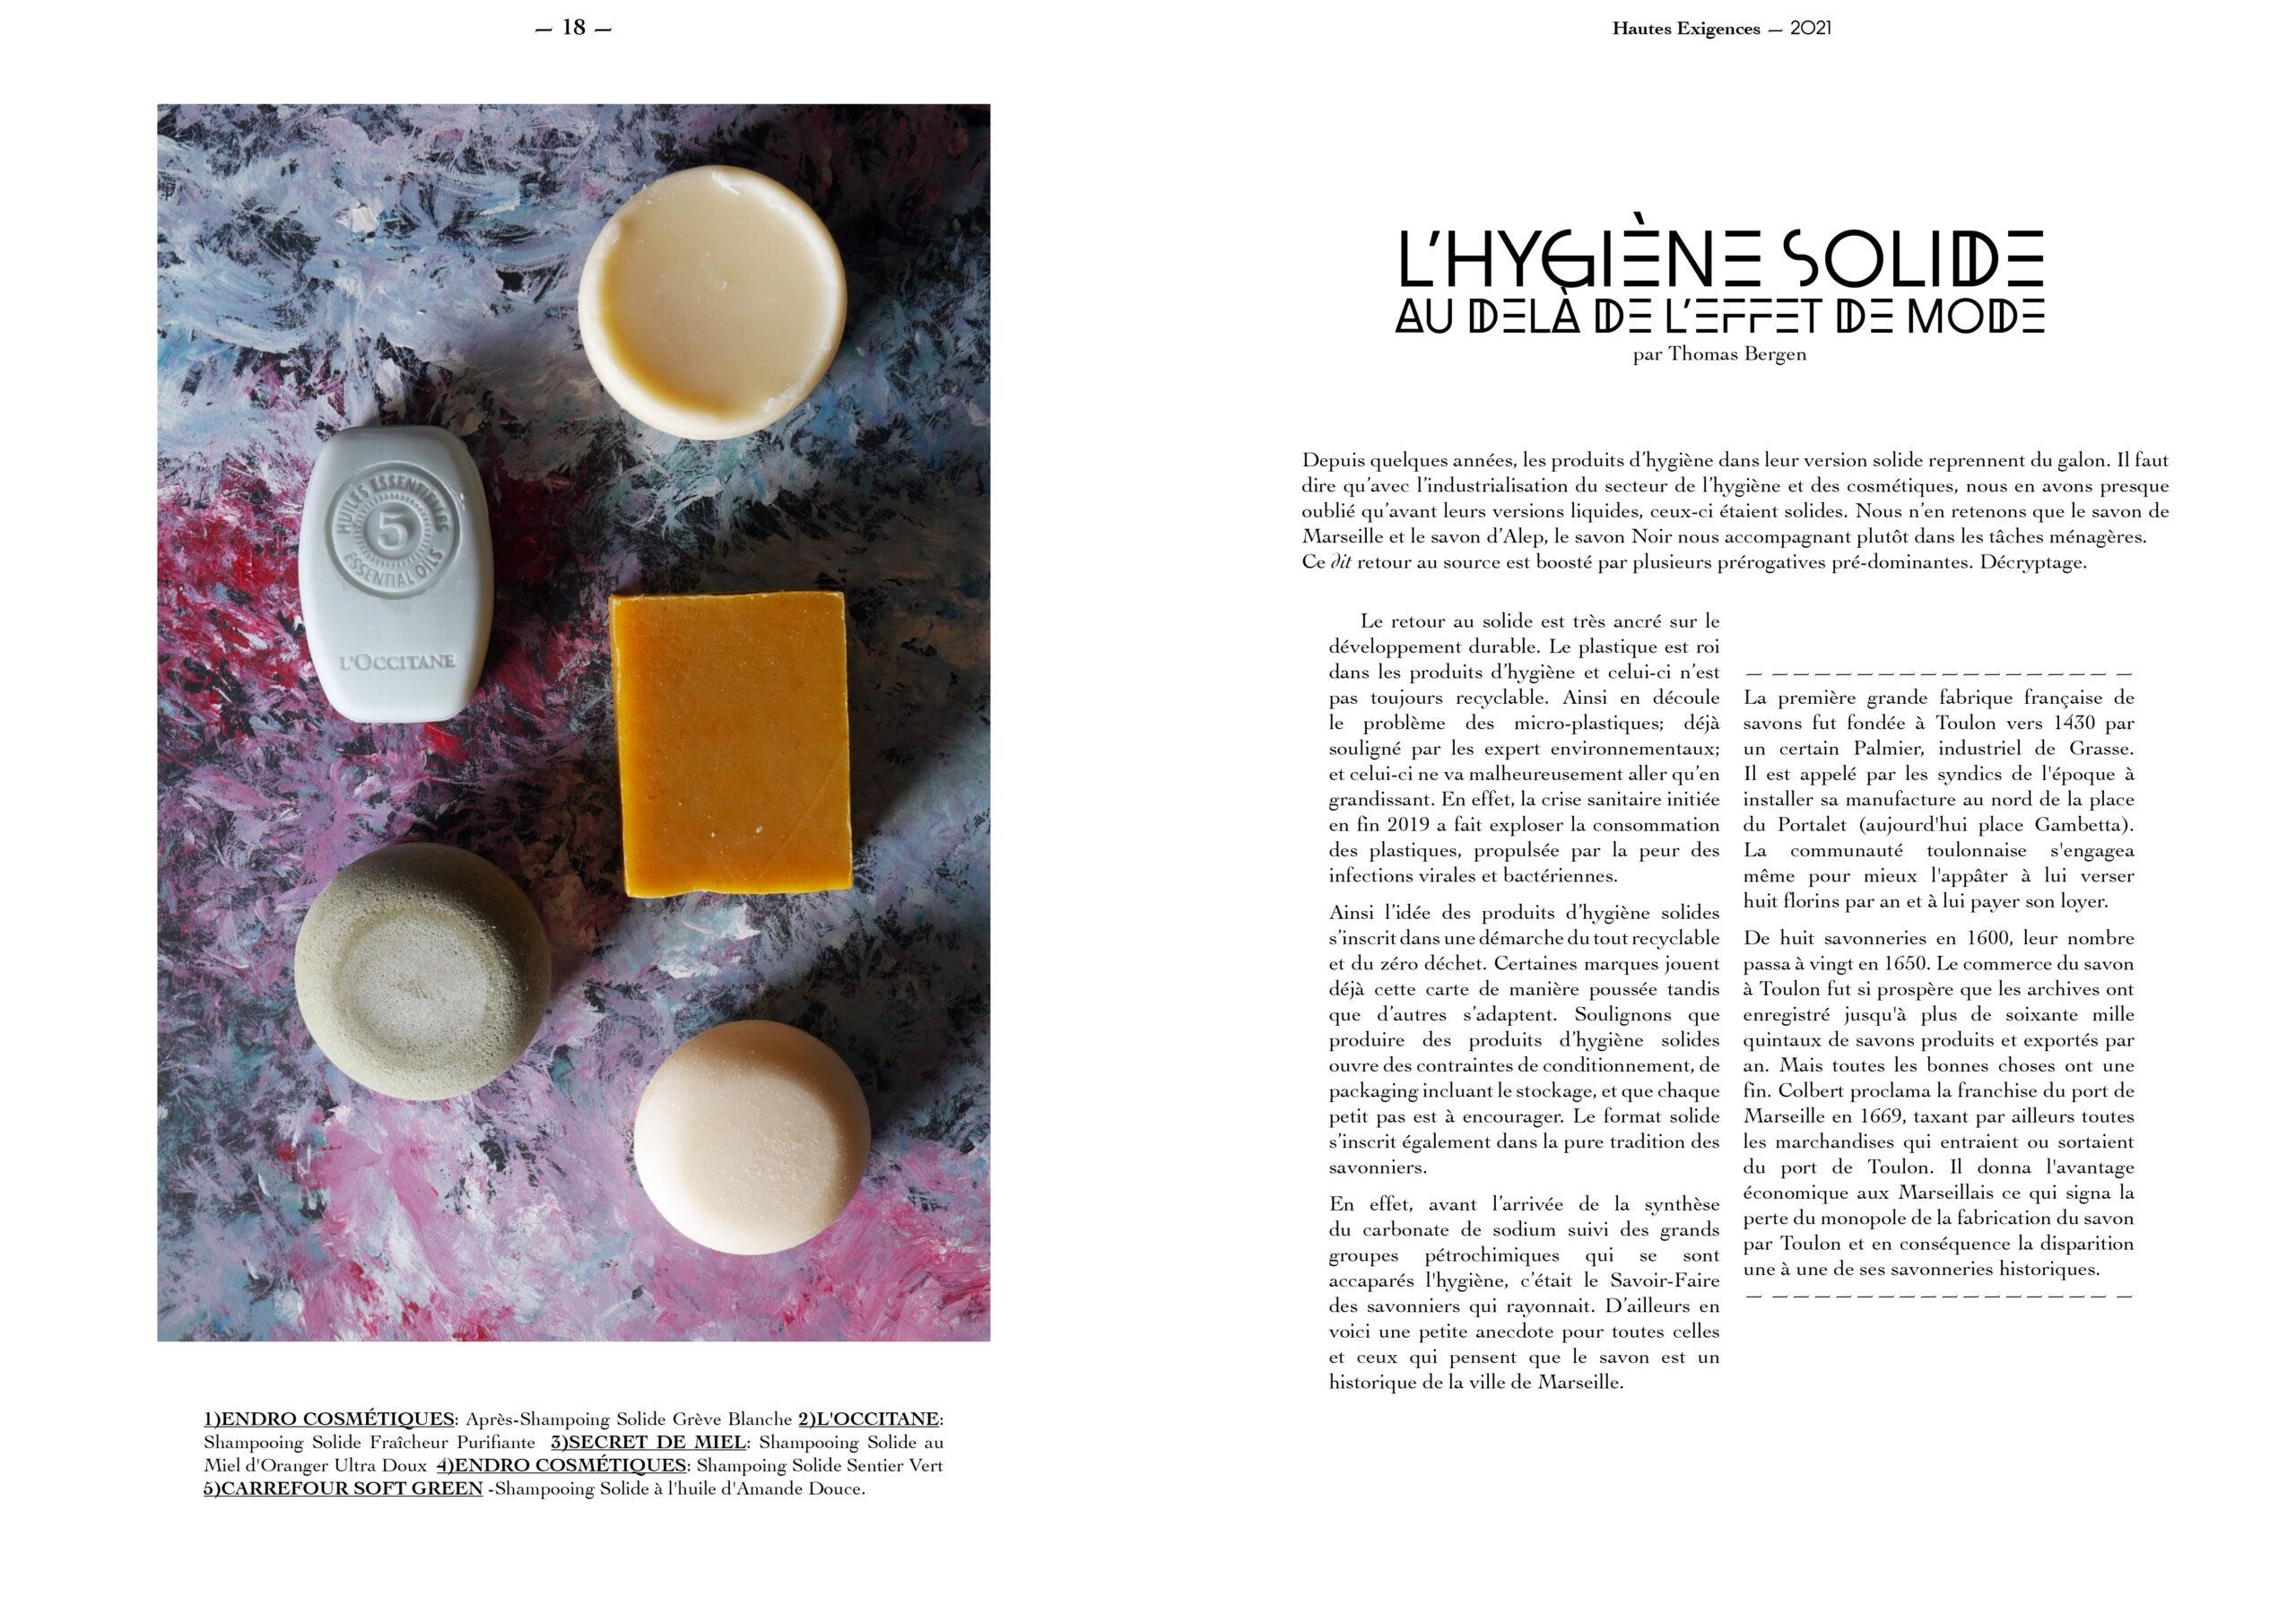 Hautes Exigences Magazine Hors Serie 2021 page 18-19